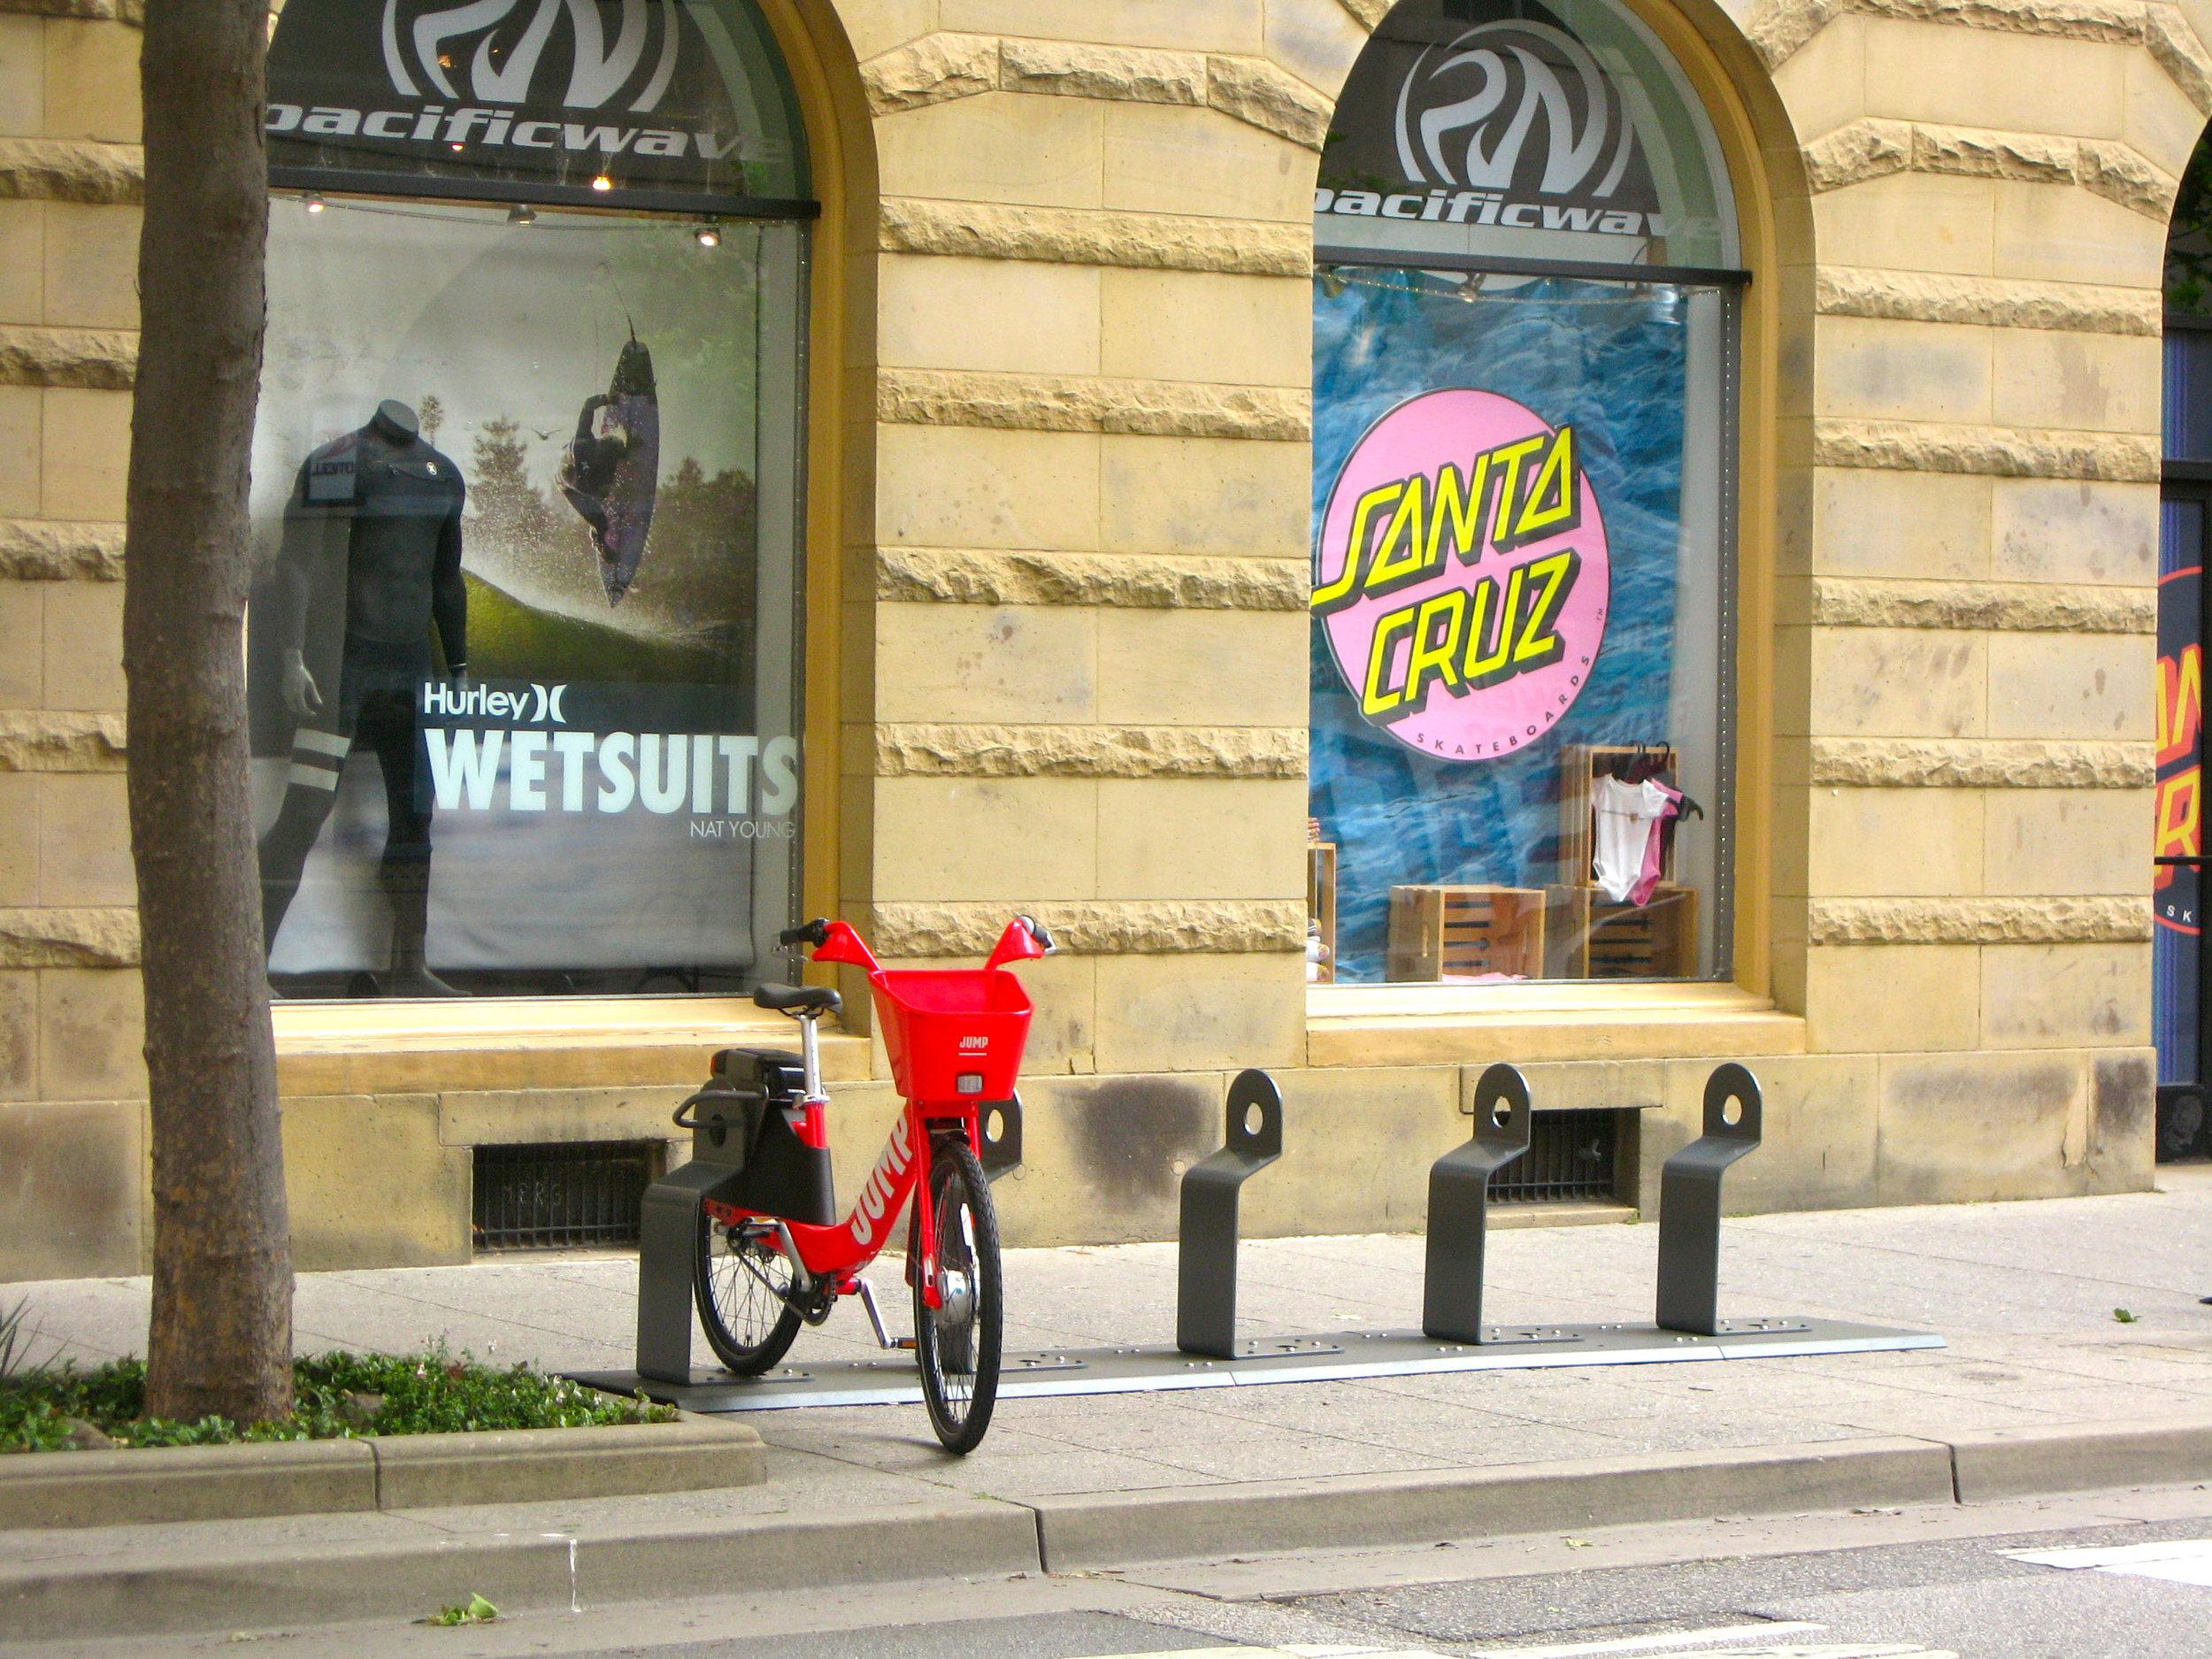 Jumpbike Downtown Santa Cruz.